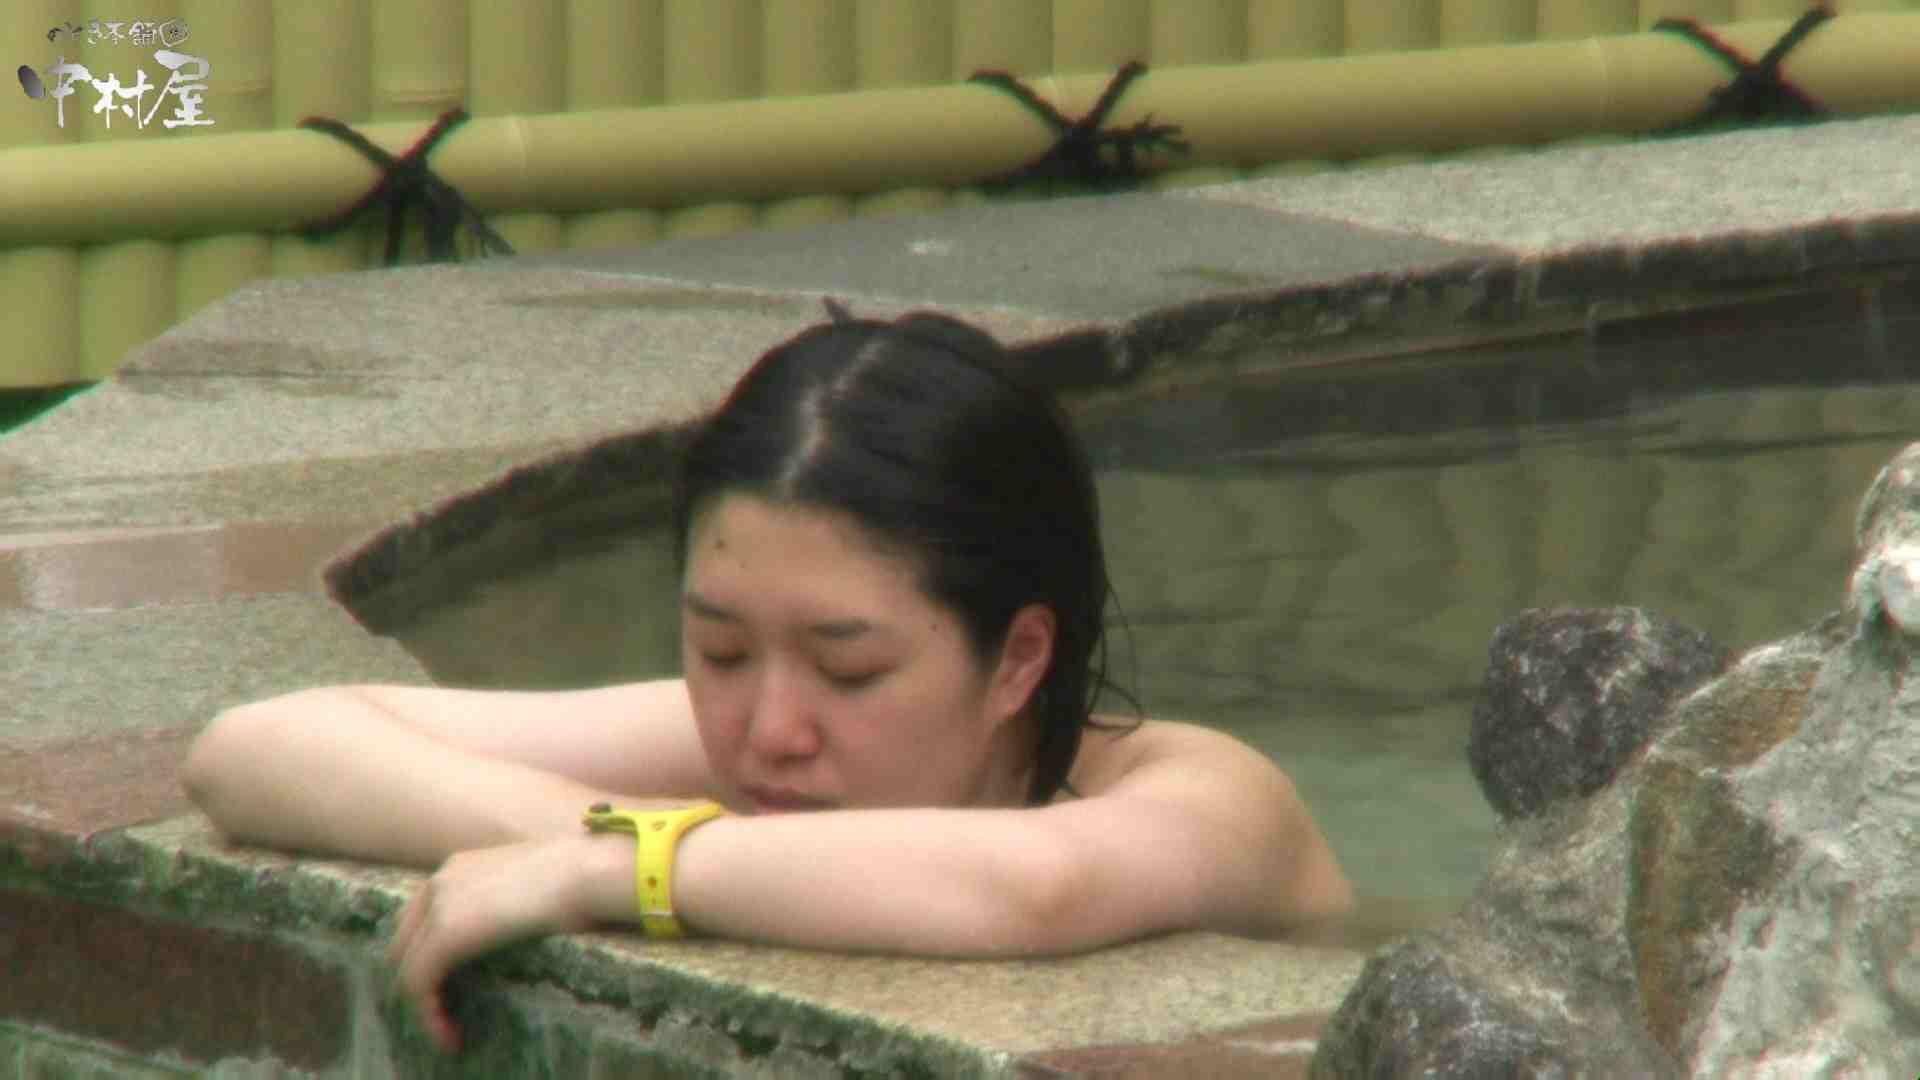 Aquaな露天風呂Vol.946 露天 オマンコ無修正動画無料 64画像 23